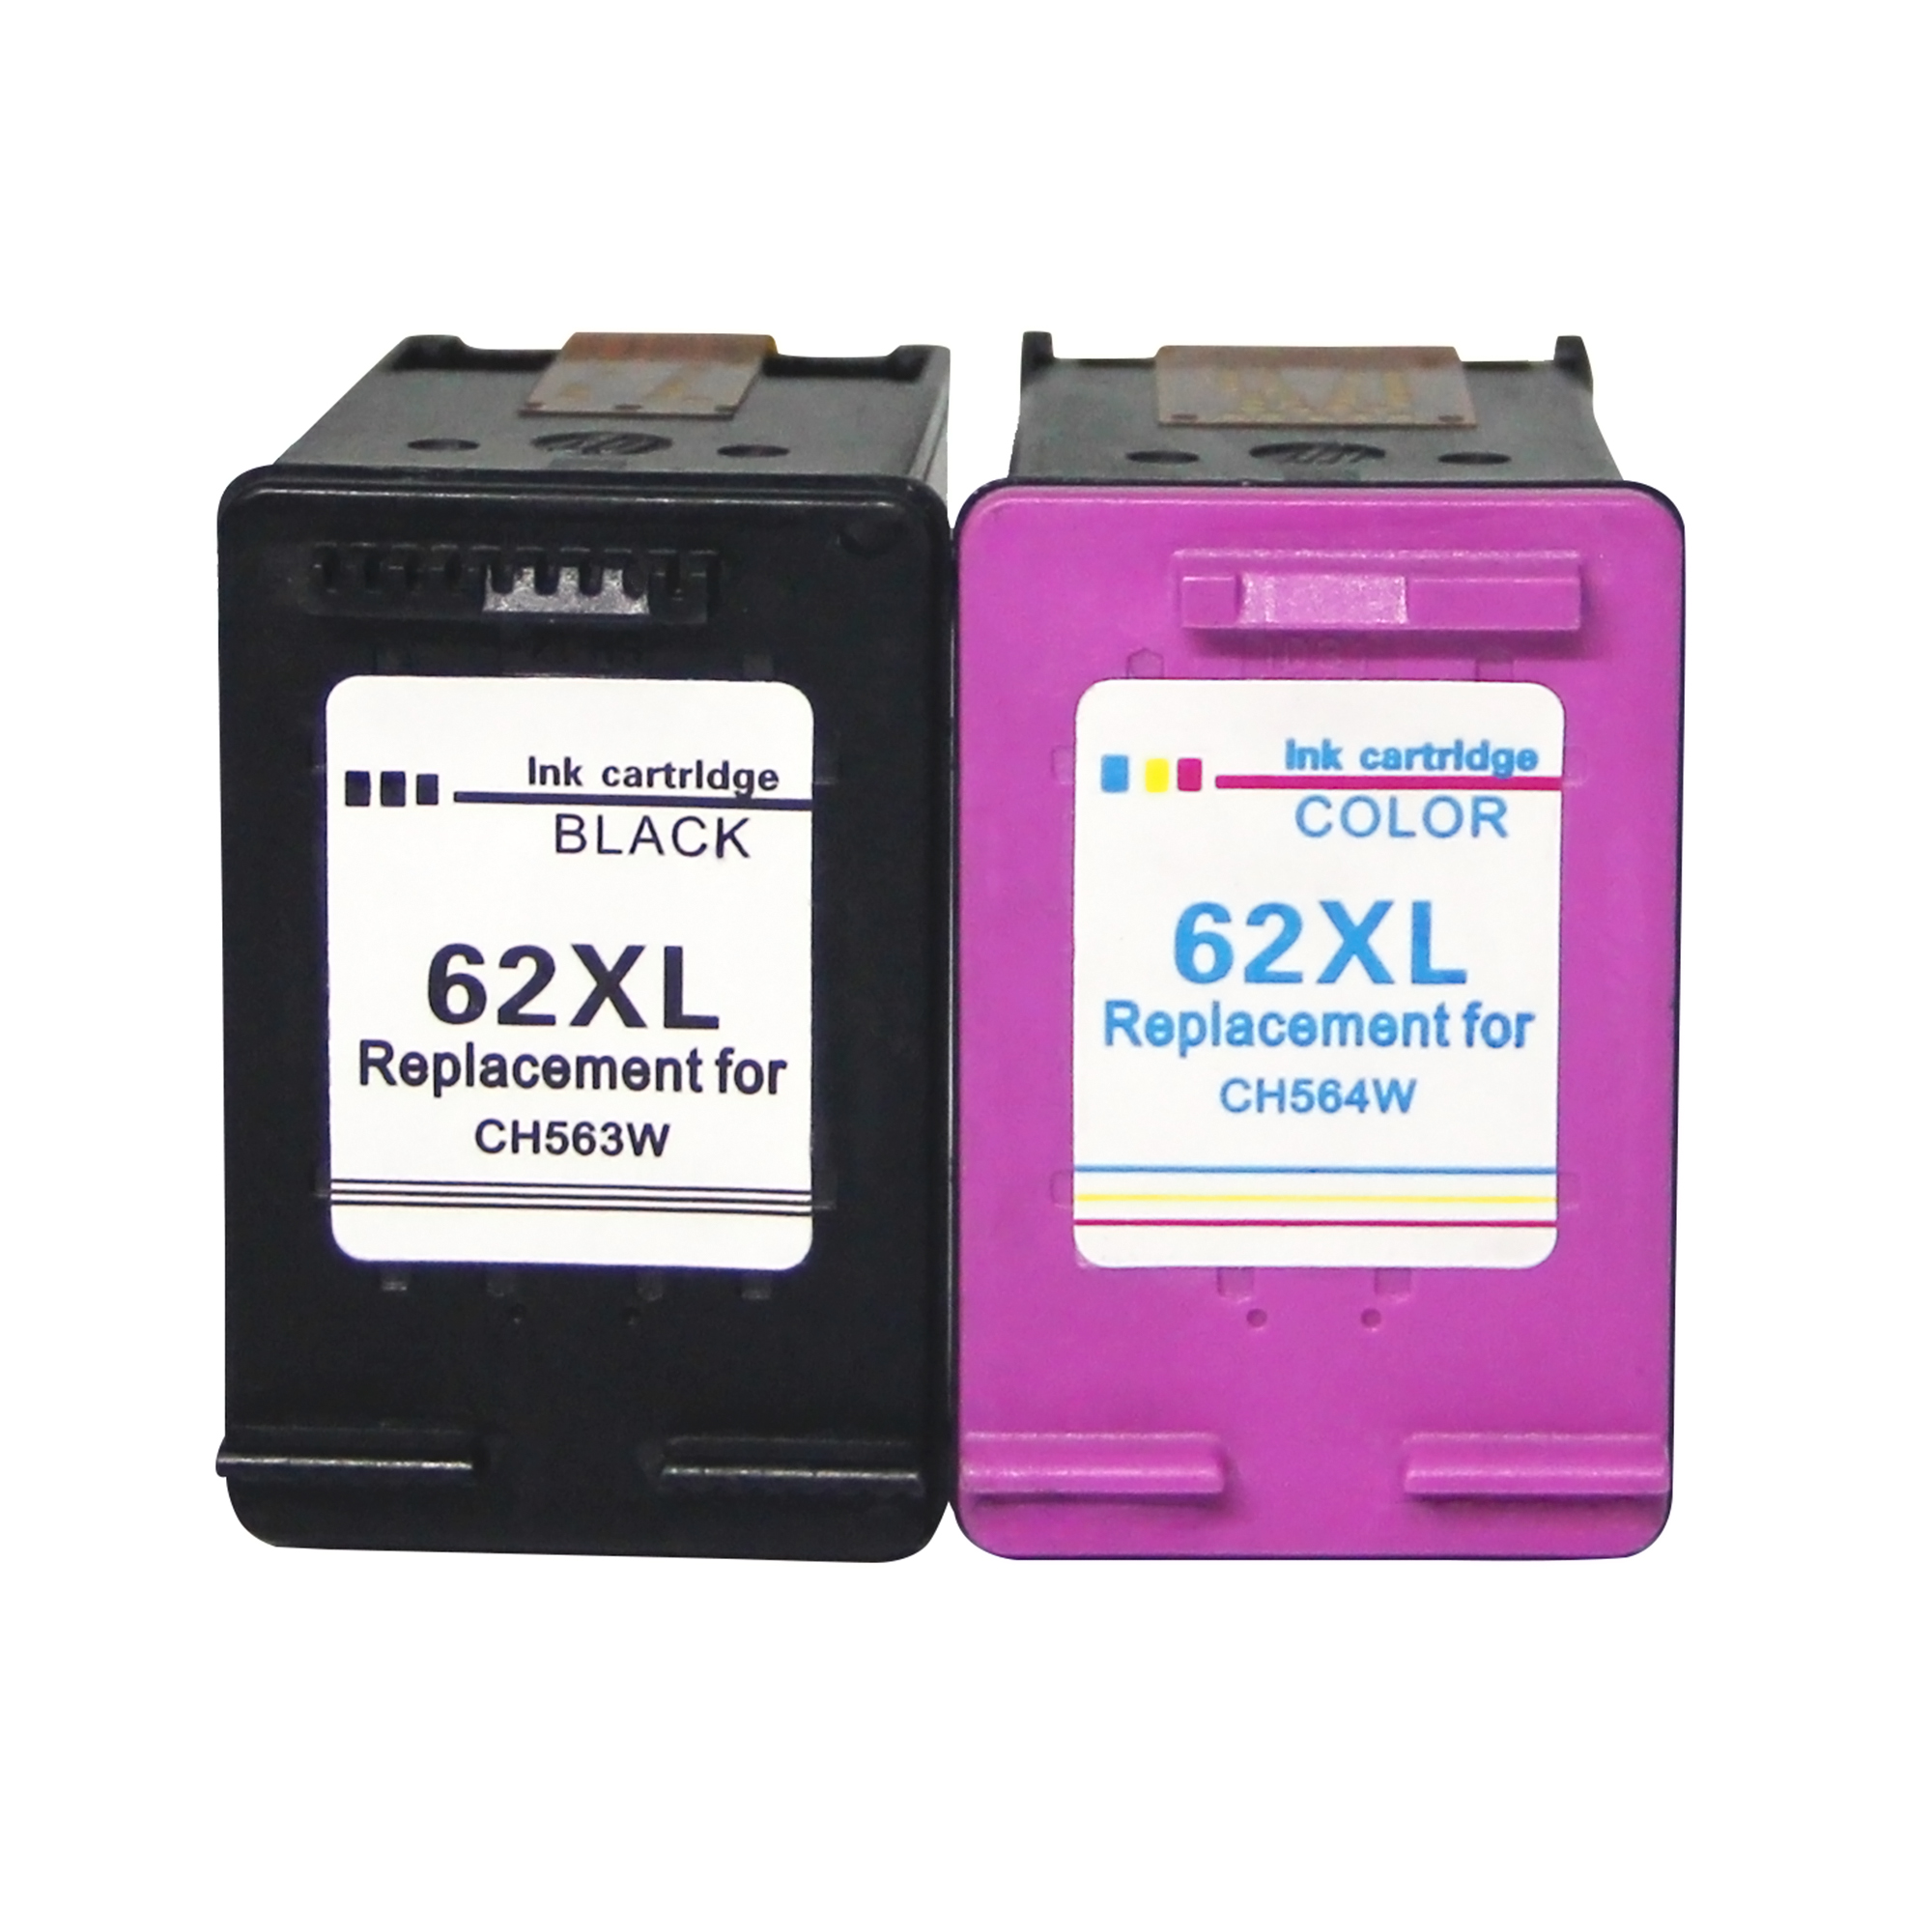 Pengganti HP 62 XL Ink Cartridge HP ENVY 5640 5540 5546 5544 5644 HP Officejet 5742 5744 200 250 Mobileimpresoras